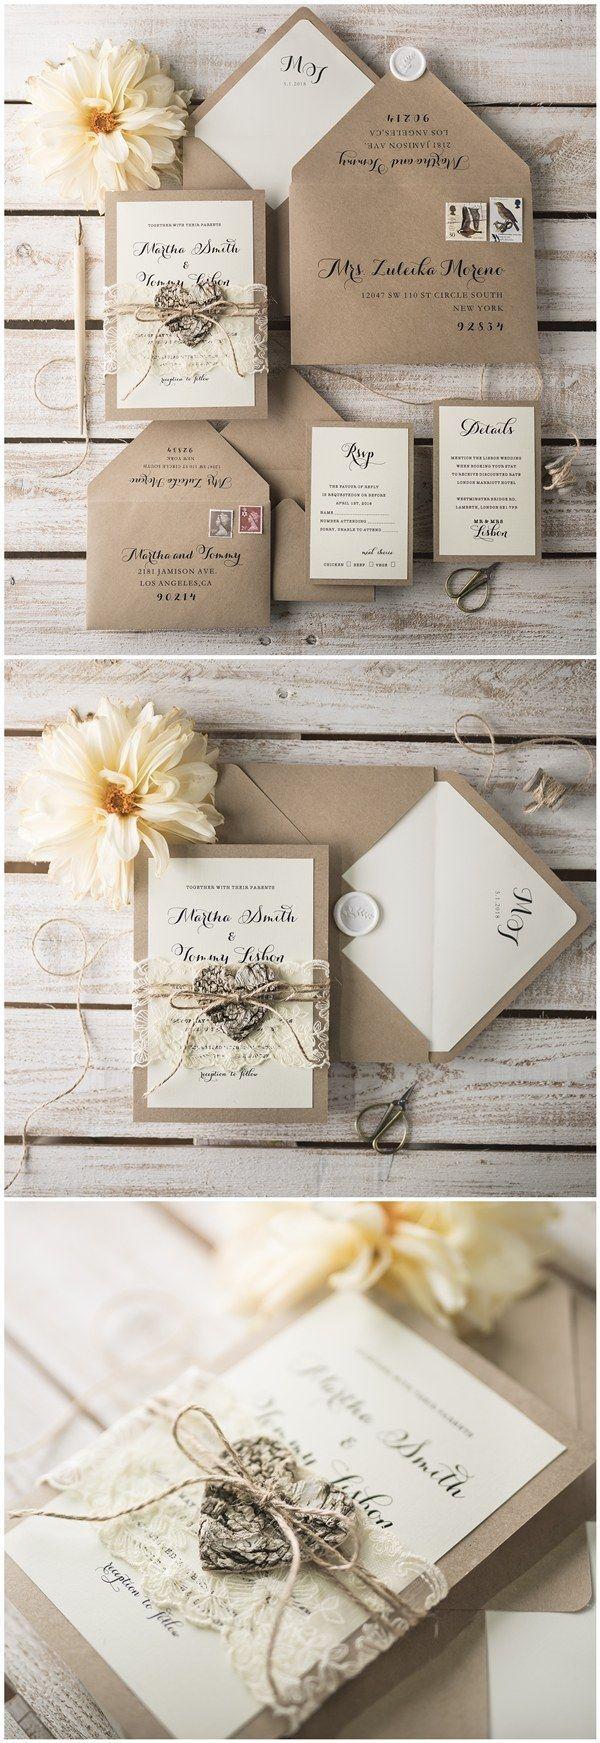 wedding invitations gifts%0A Rustic kraft paper wedding invitations   http   www deerpearlflowers com